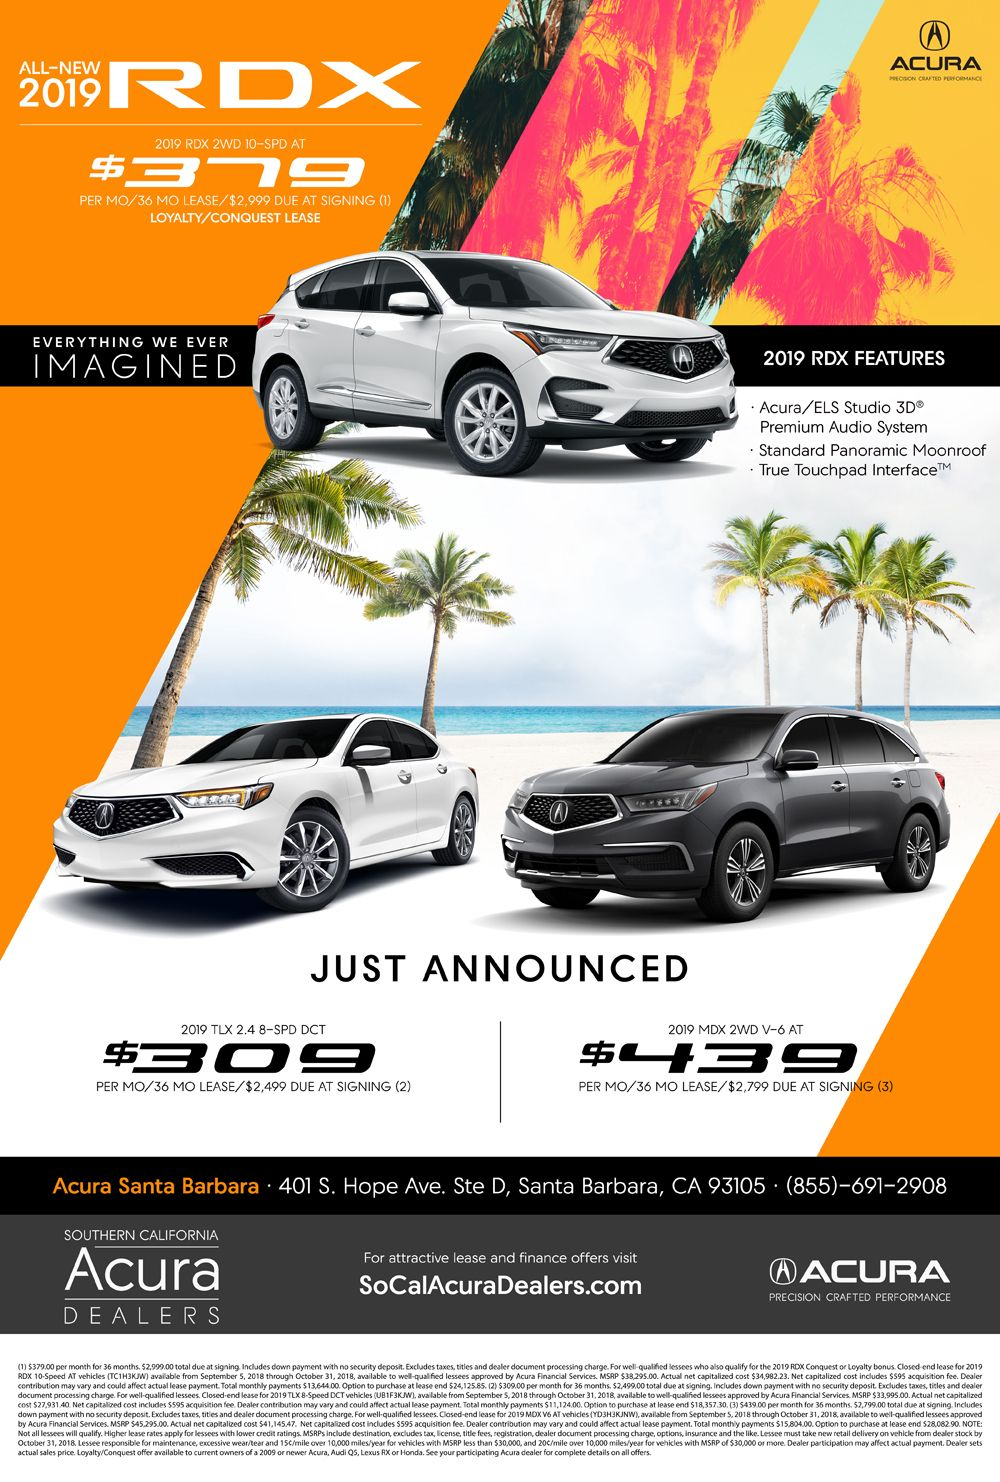 Acura Rdx Automotive News Luxury Cars Expensive Fancy